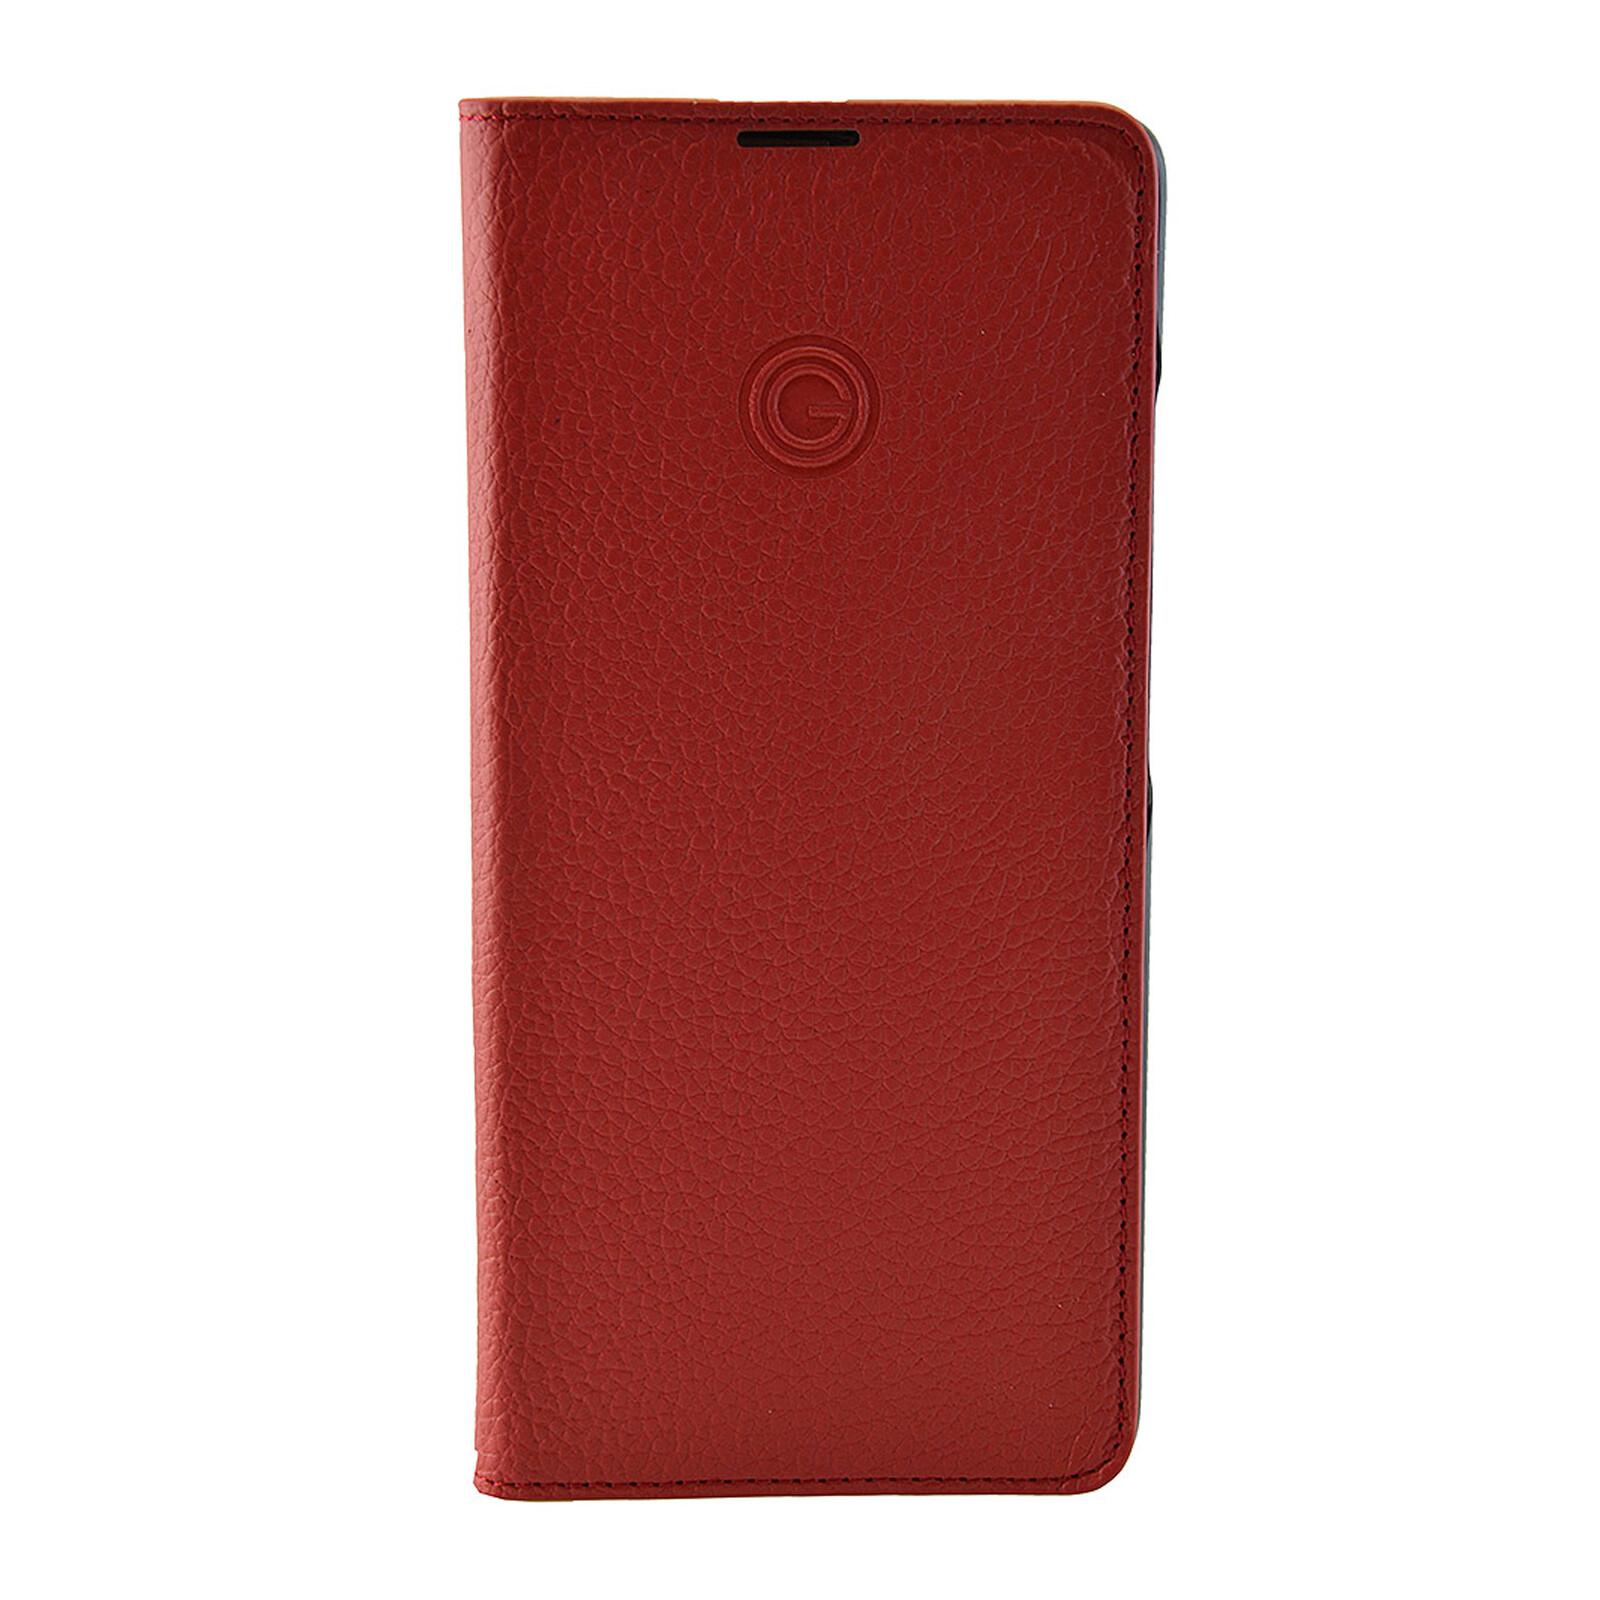 Galeli Book MARC Samsung Galaxy S21 swiss red